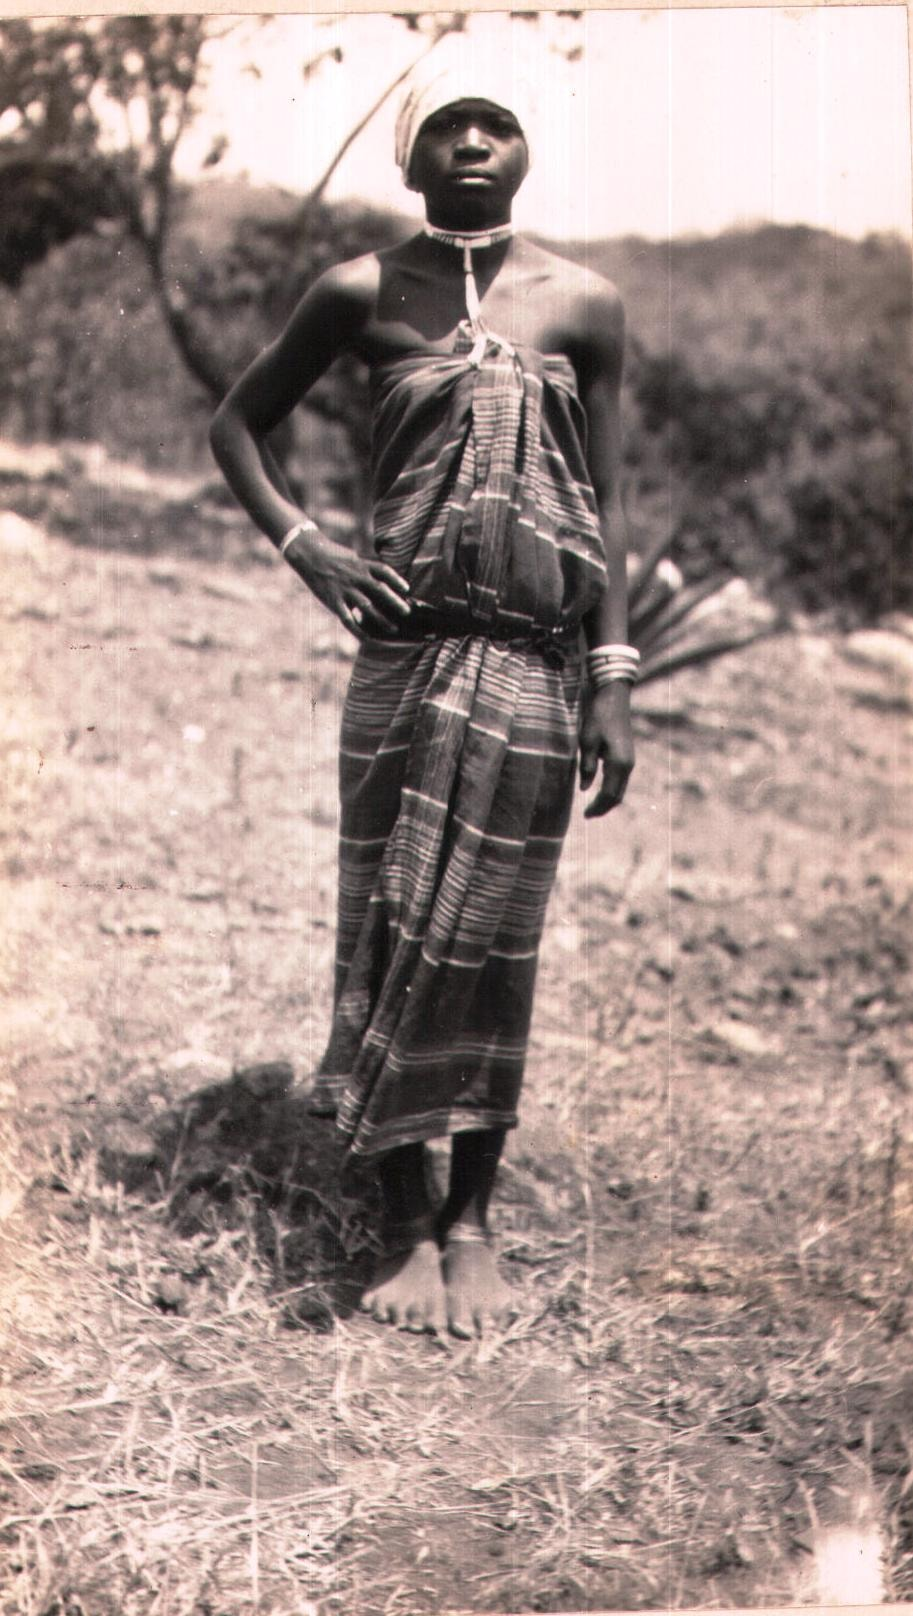 Girls Chibemba